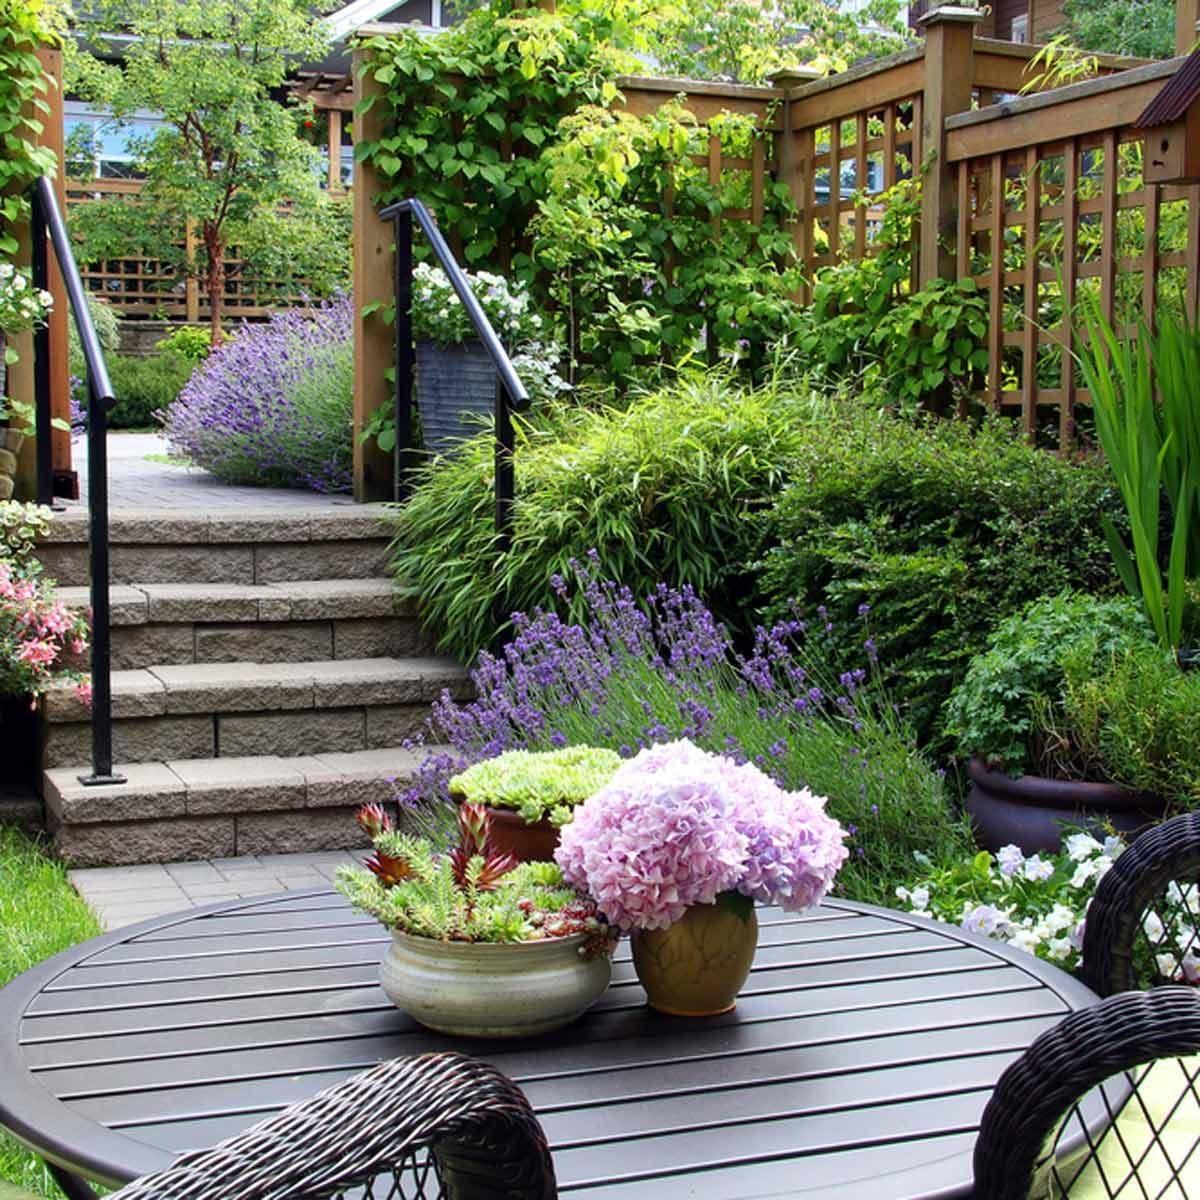 14 Small Yard Landscaping Ideas to Impress | Family Handyman on Small Landscape Garden Ideas  id=41259